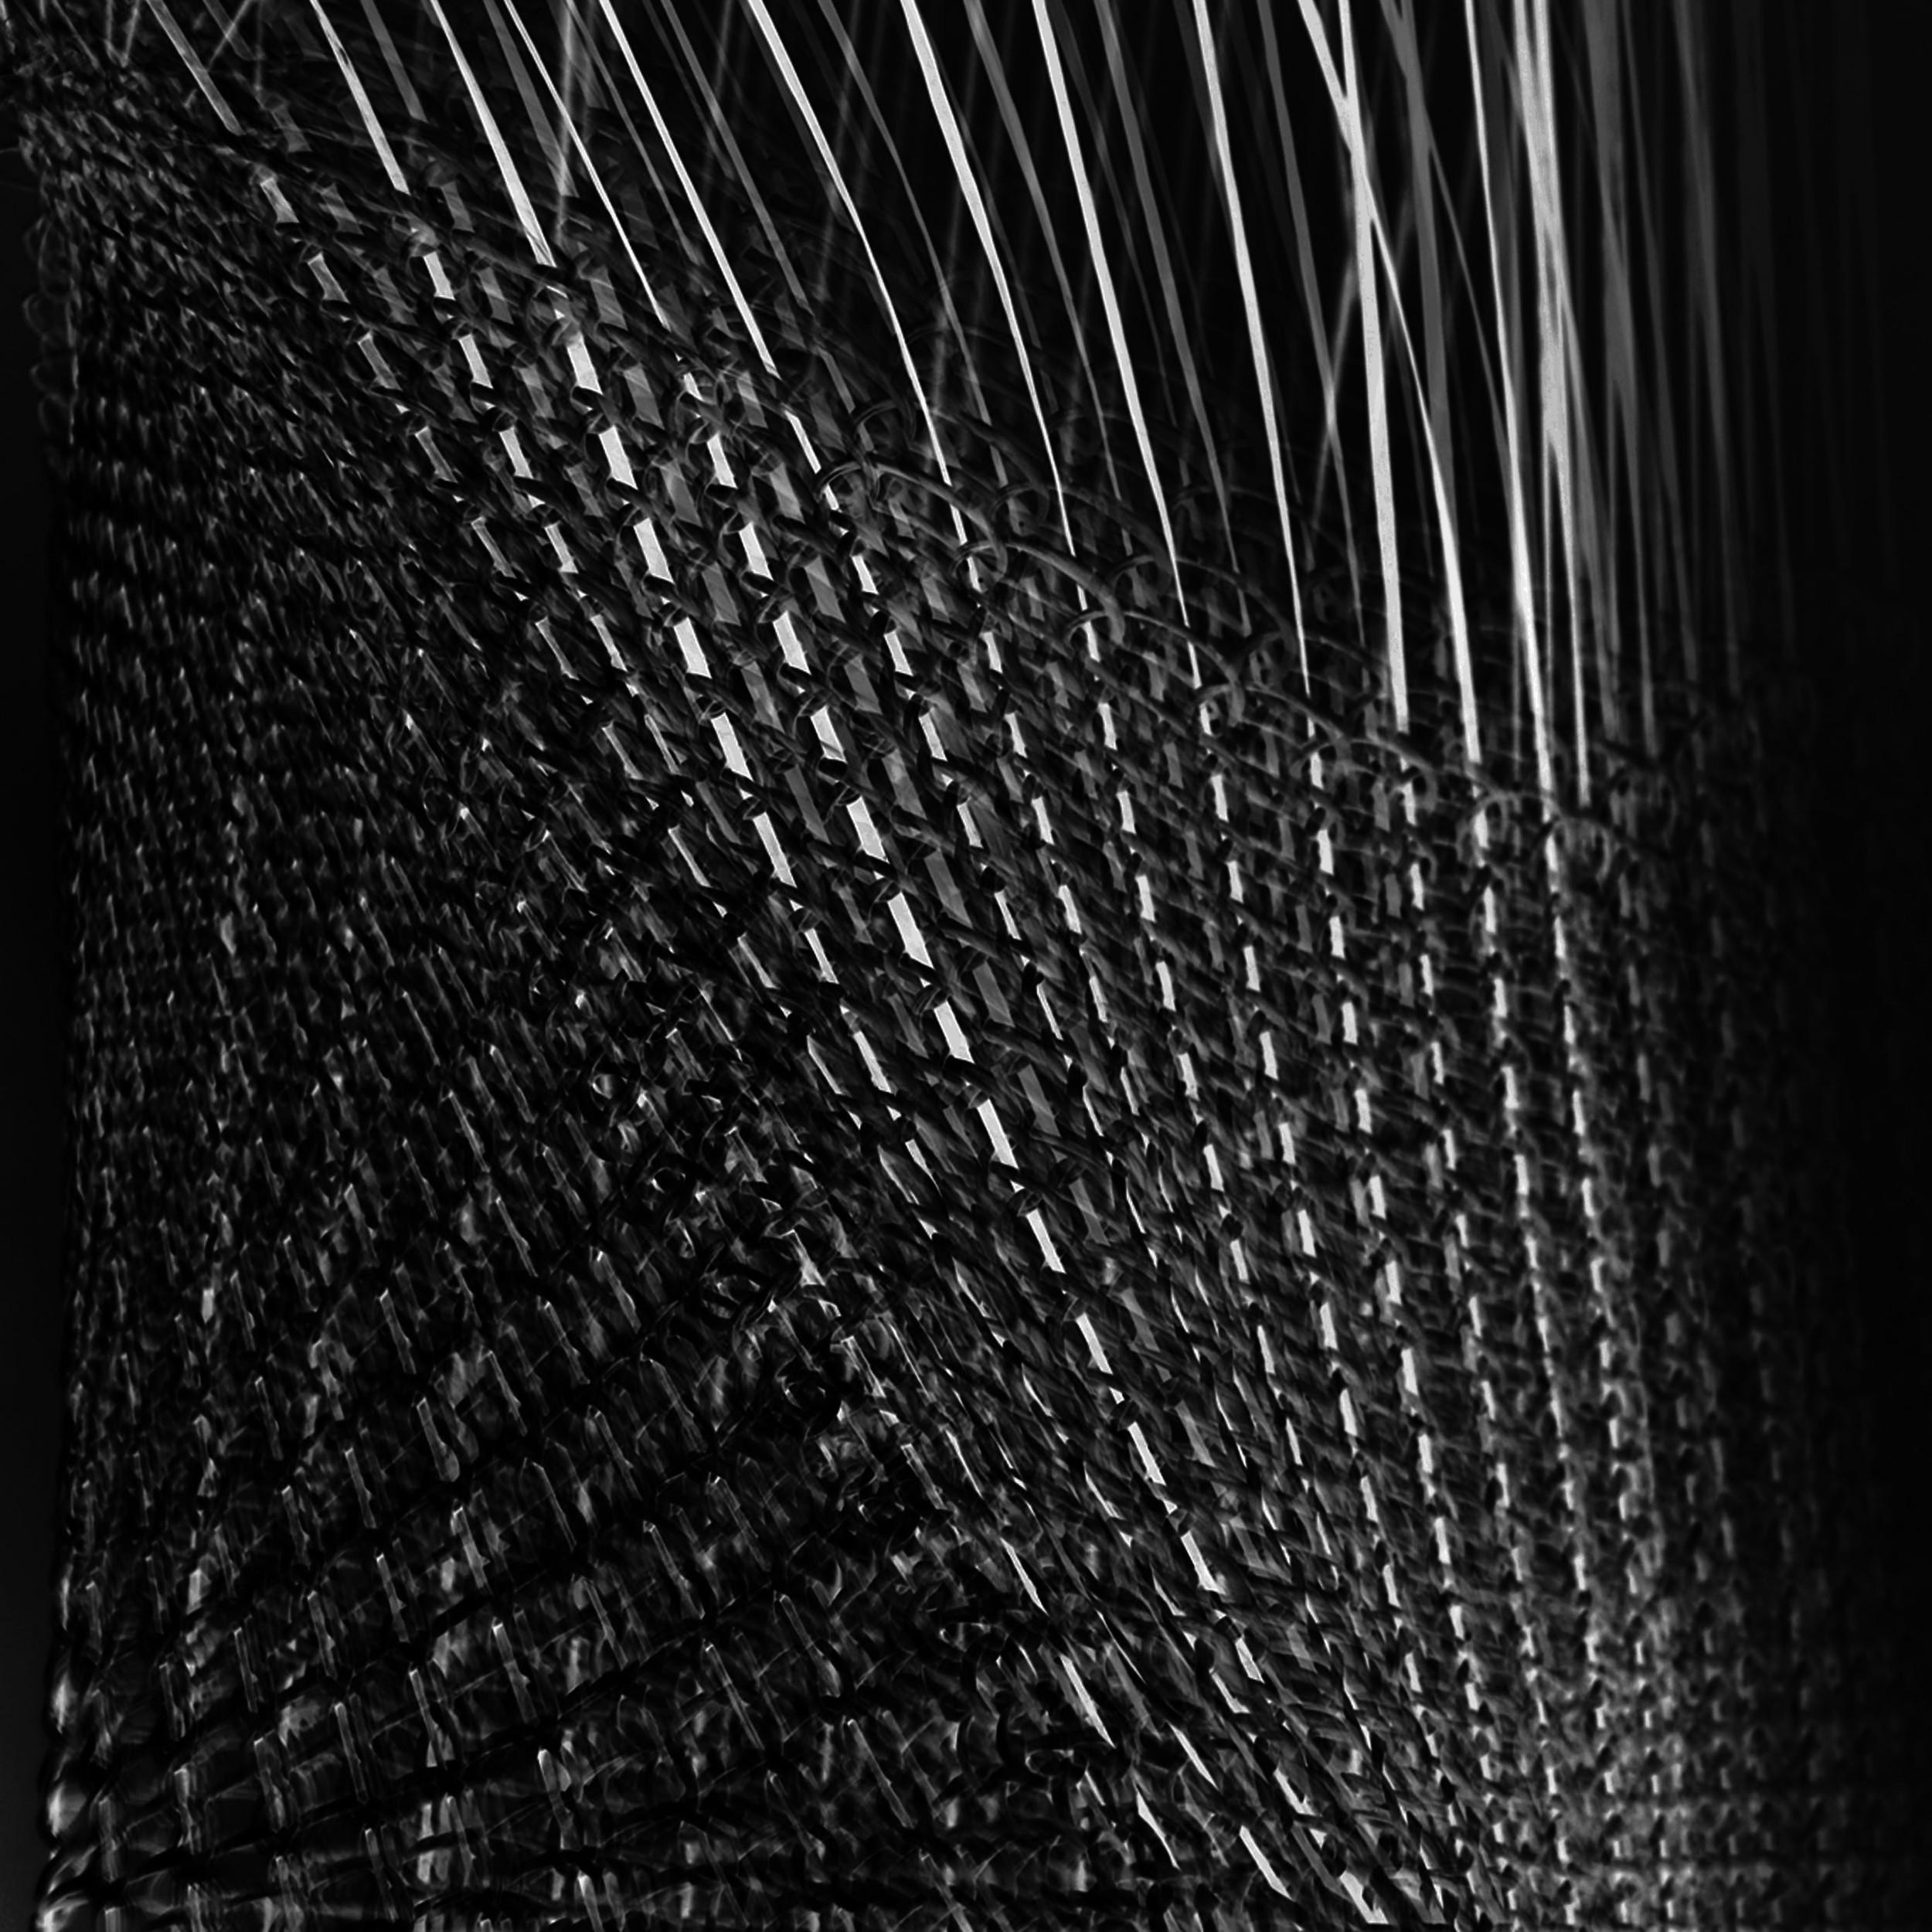 _knit pattern